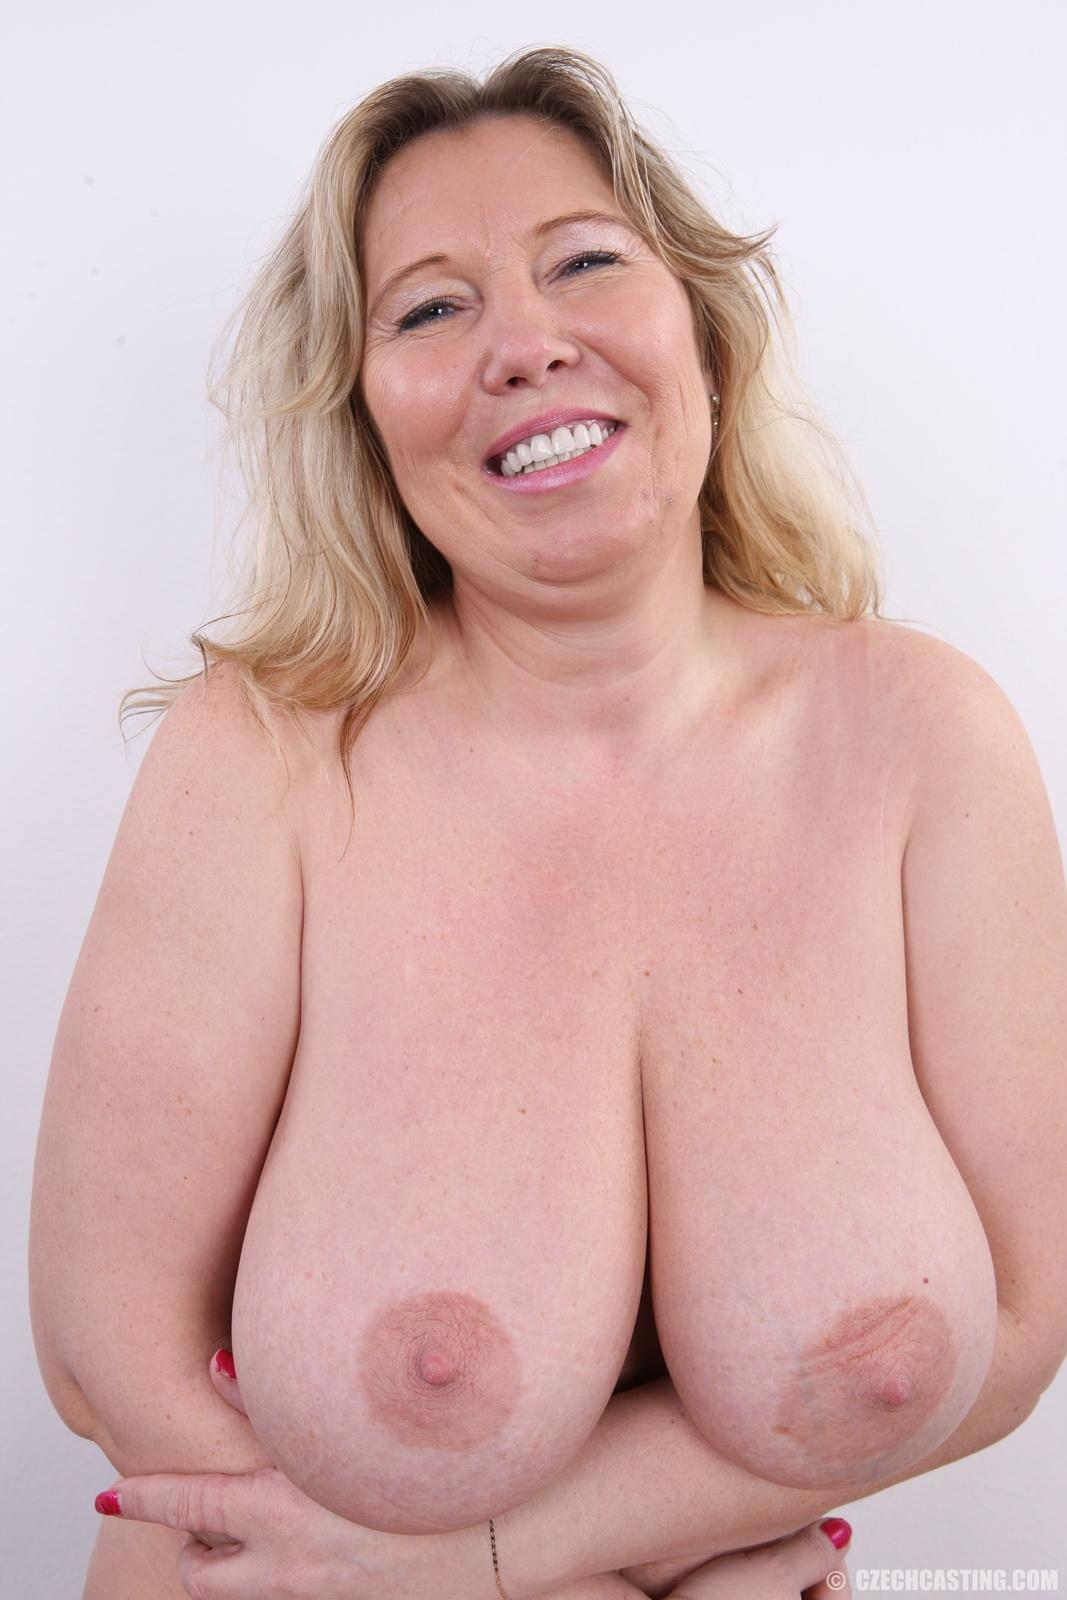 Czech republic large breasts mother fuck boy 2